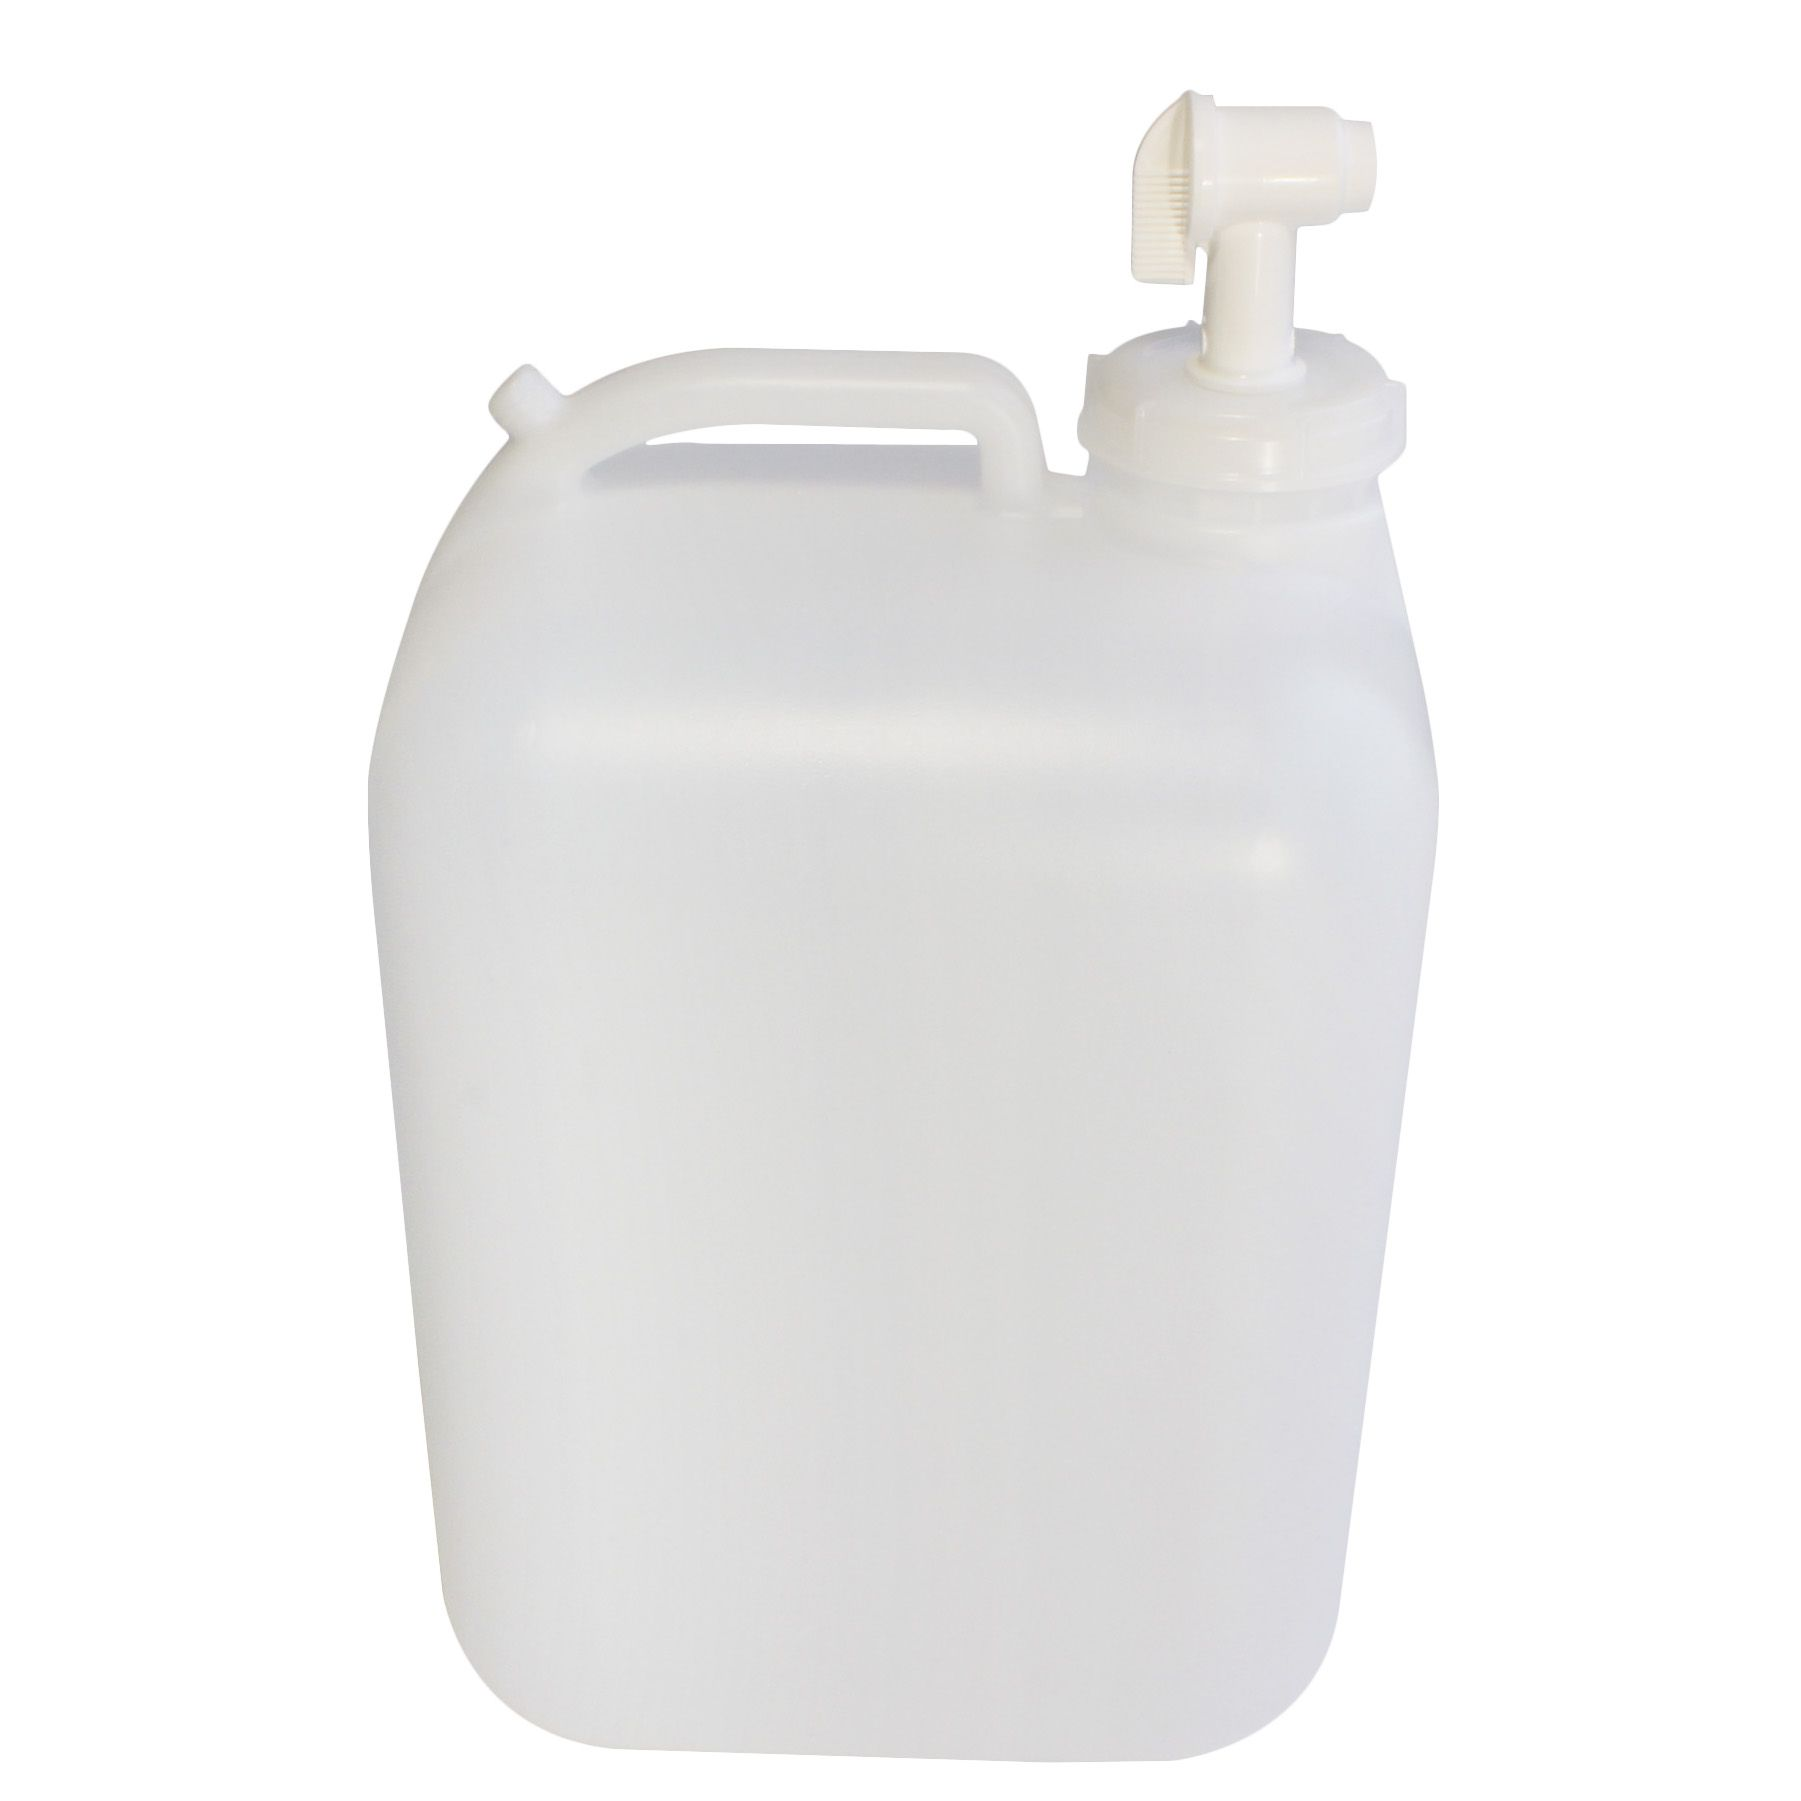 5 Gal Water Jug W Spigot Gallon Water Jug Water Jug Water Filtration Bottle